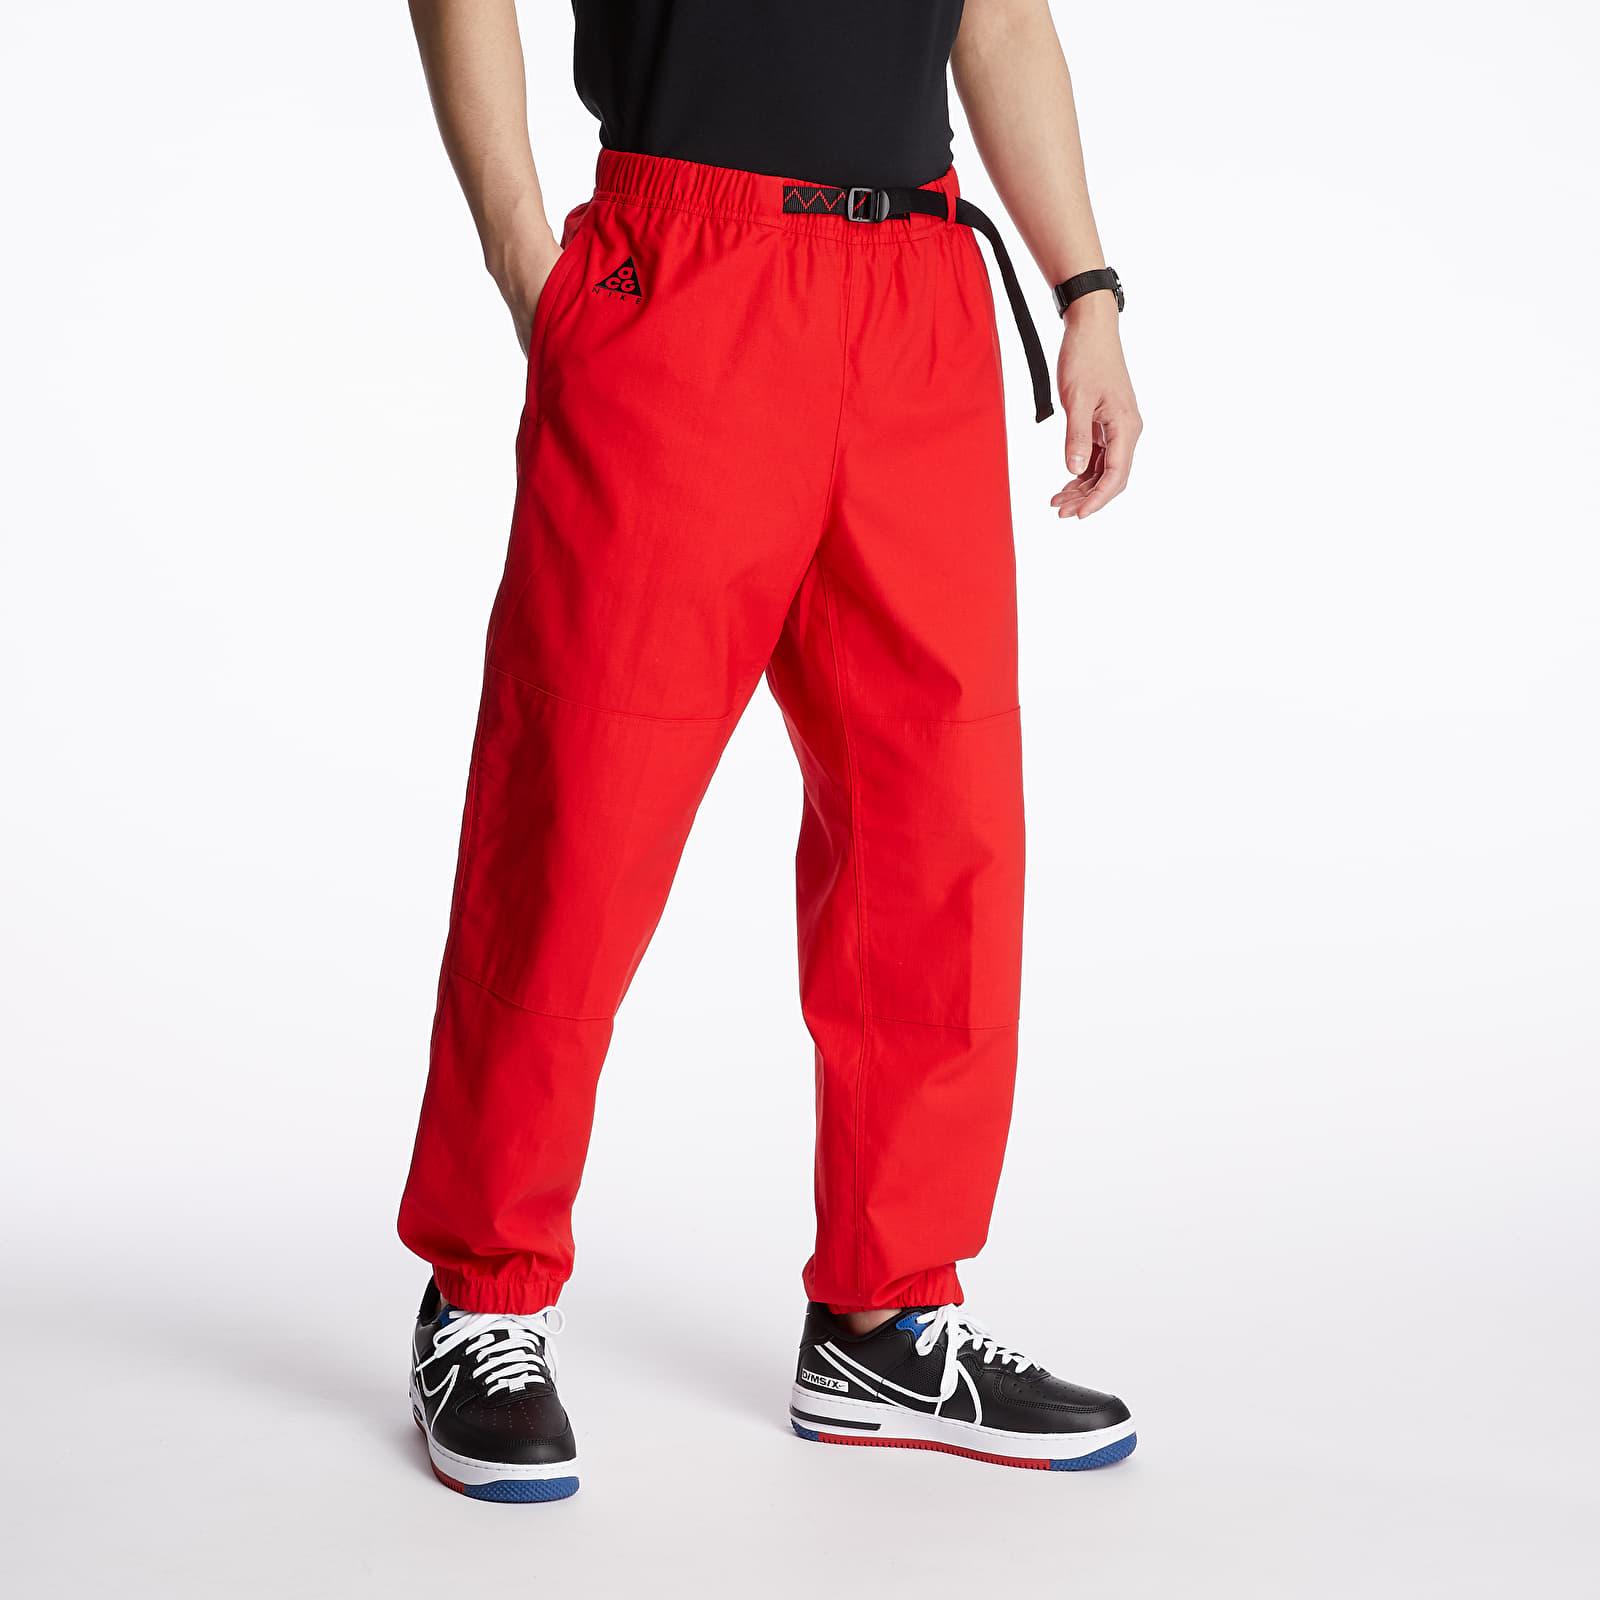 Pants and jeans Nike NRG ACG Trail Pants University Red/ Black